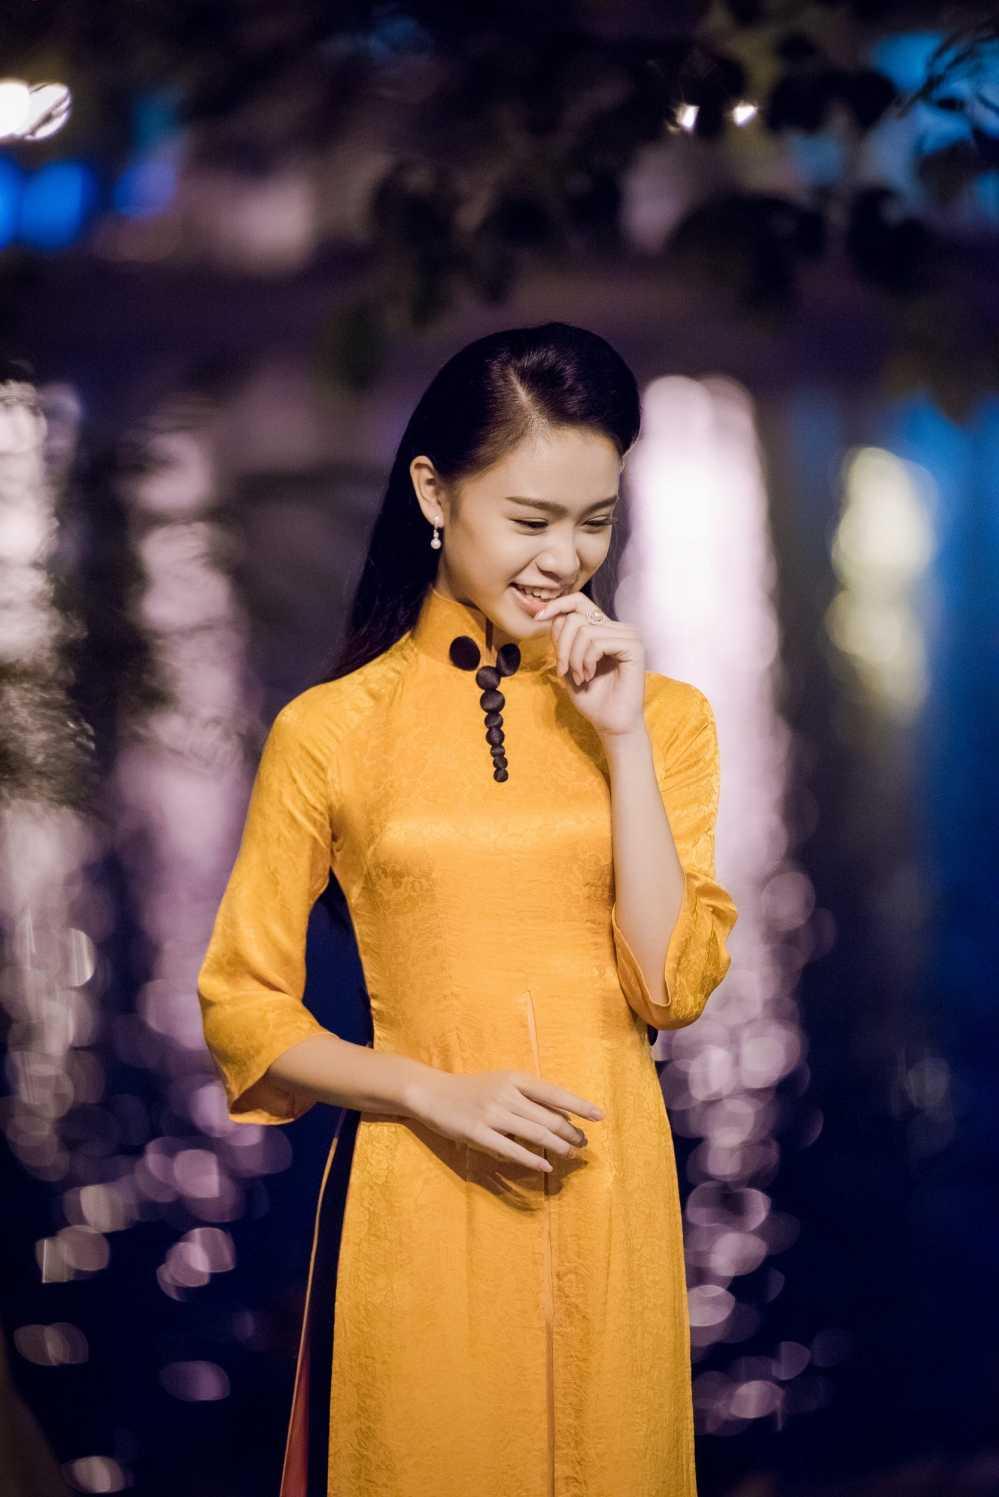 Nguoi dep hoc gioi nhat hoa hau Viet Nam bi fans 'bao vay' o su kien hinh anh 9